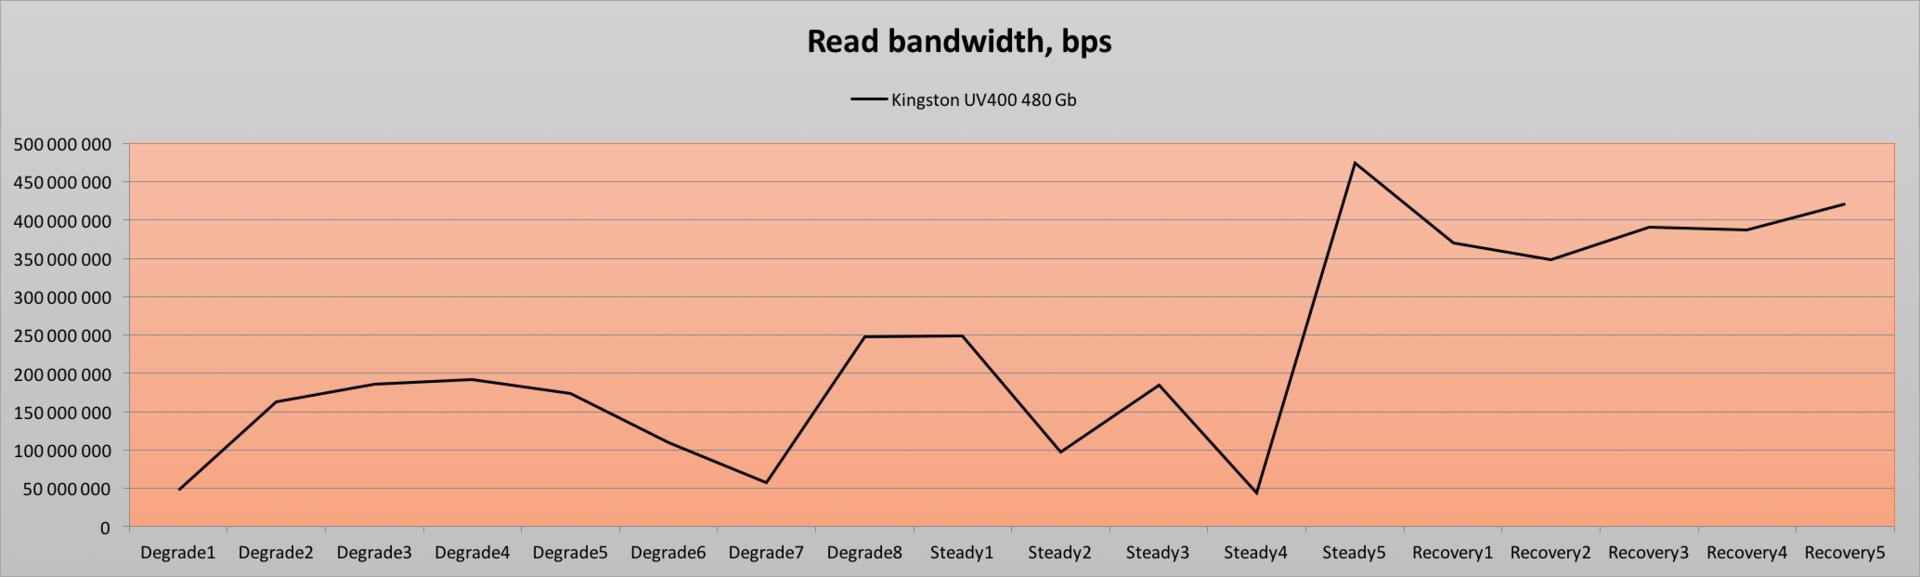 Обзор твердотельного накопителя Kingston UV400 480 Gb — SSD с «изюмом» - 16